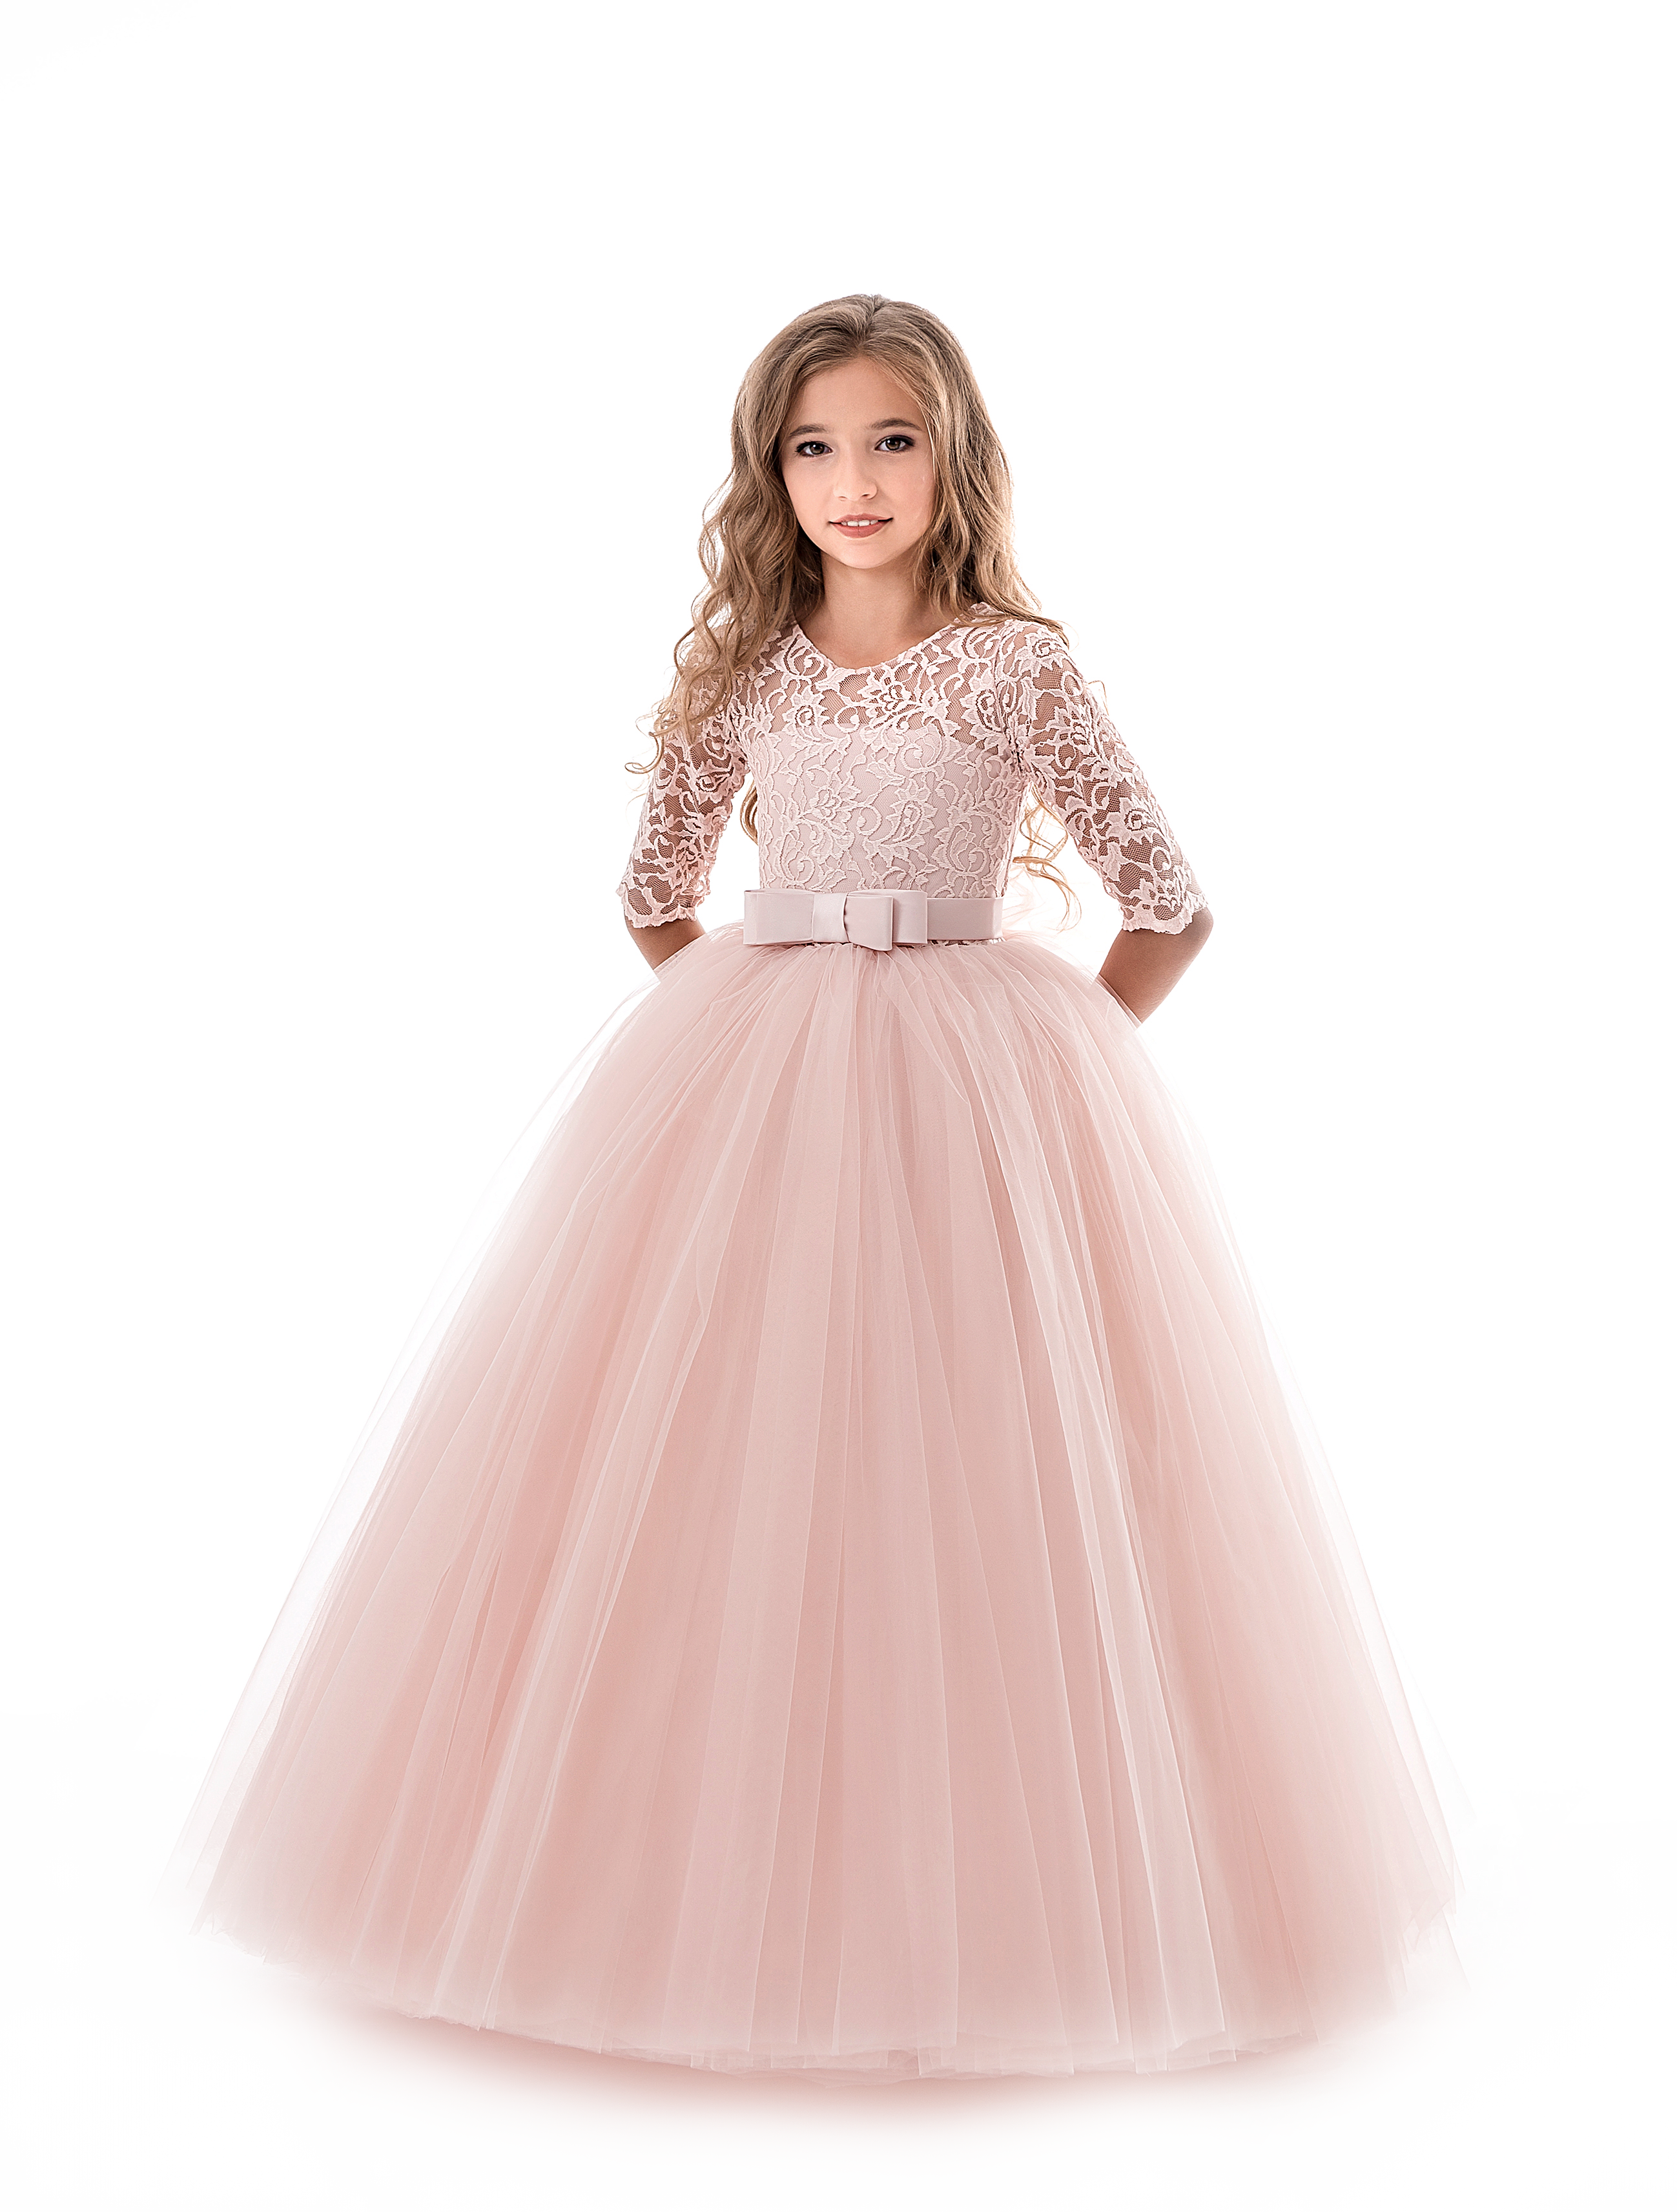 платье принцессы | primera comunión | Pinterest | Vestiditos ...